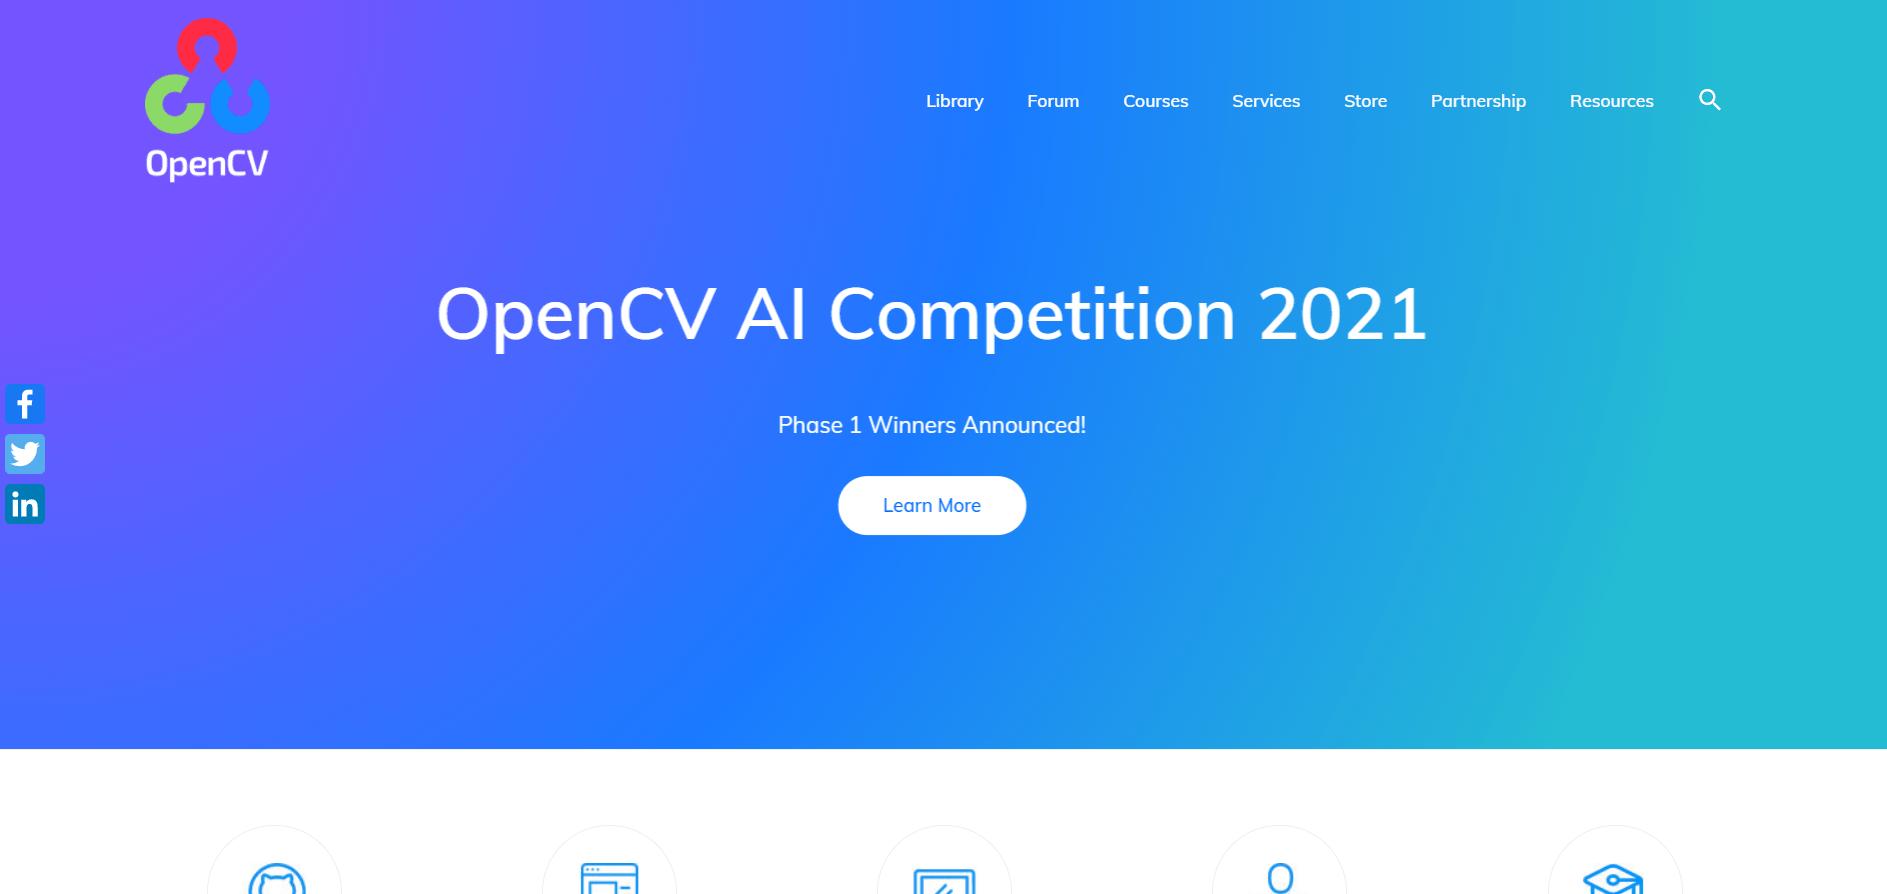 ・OpenCV